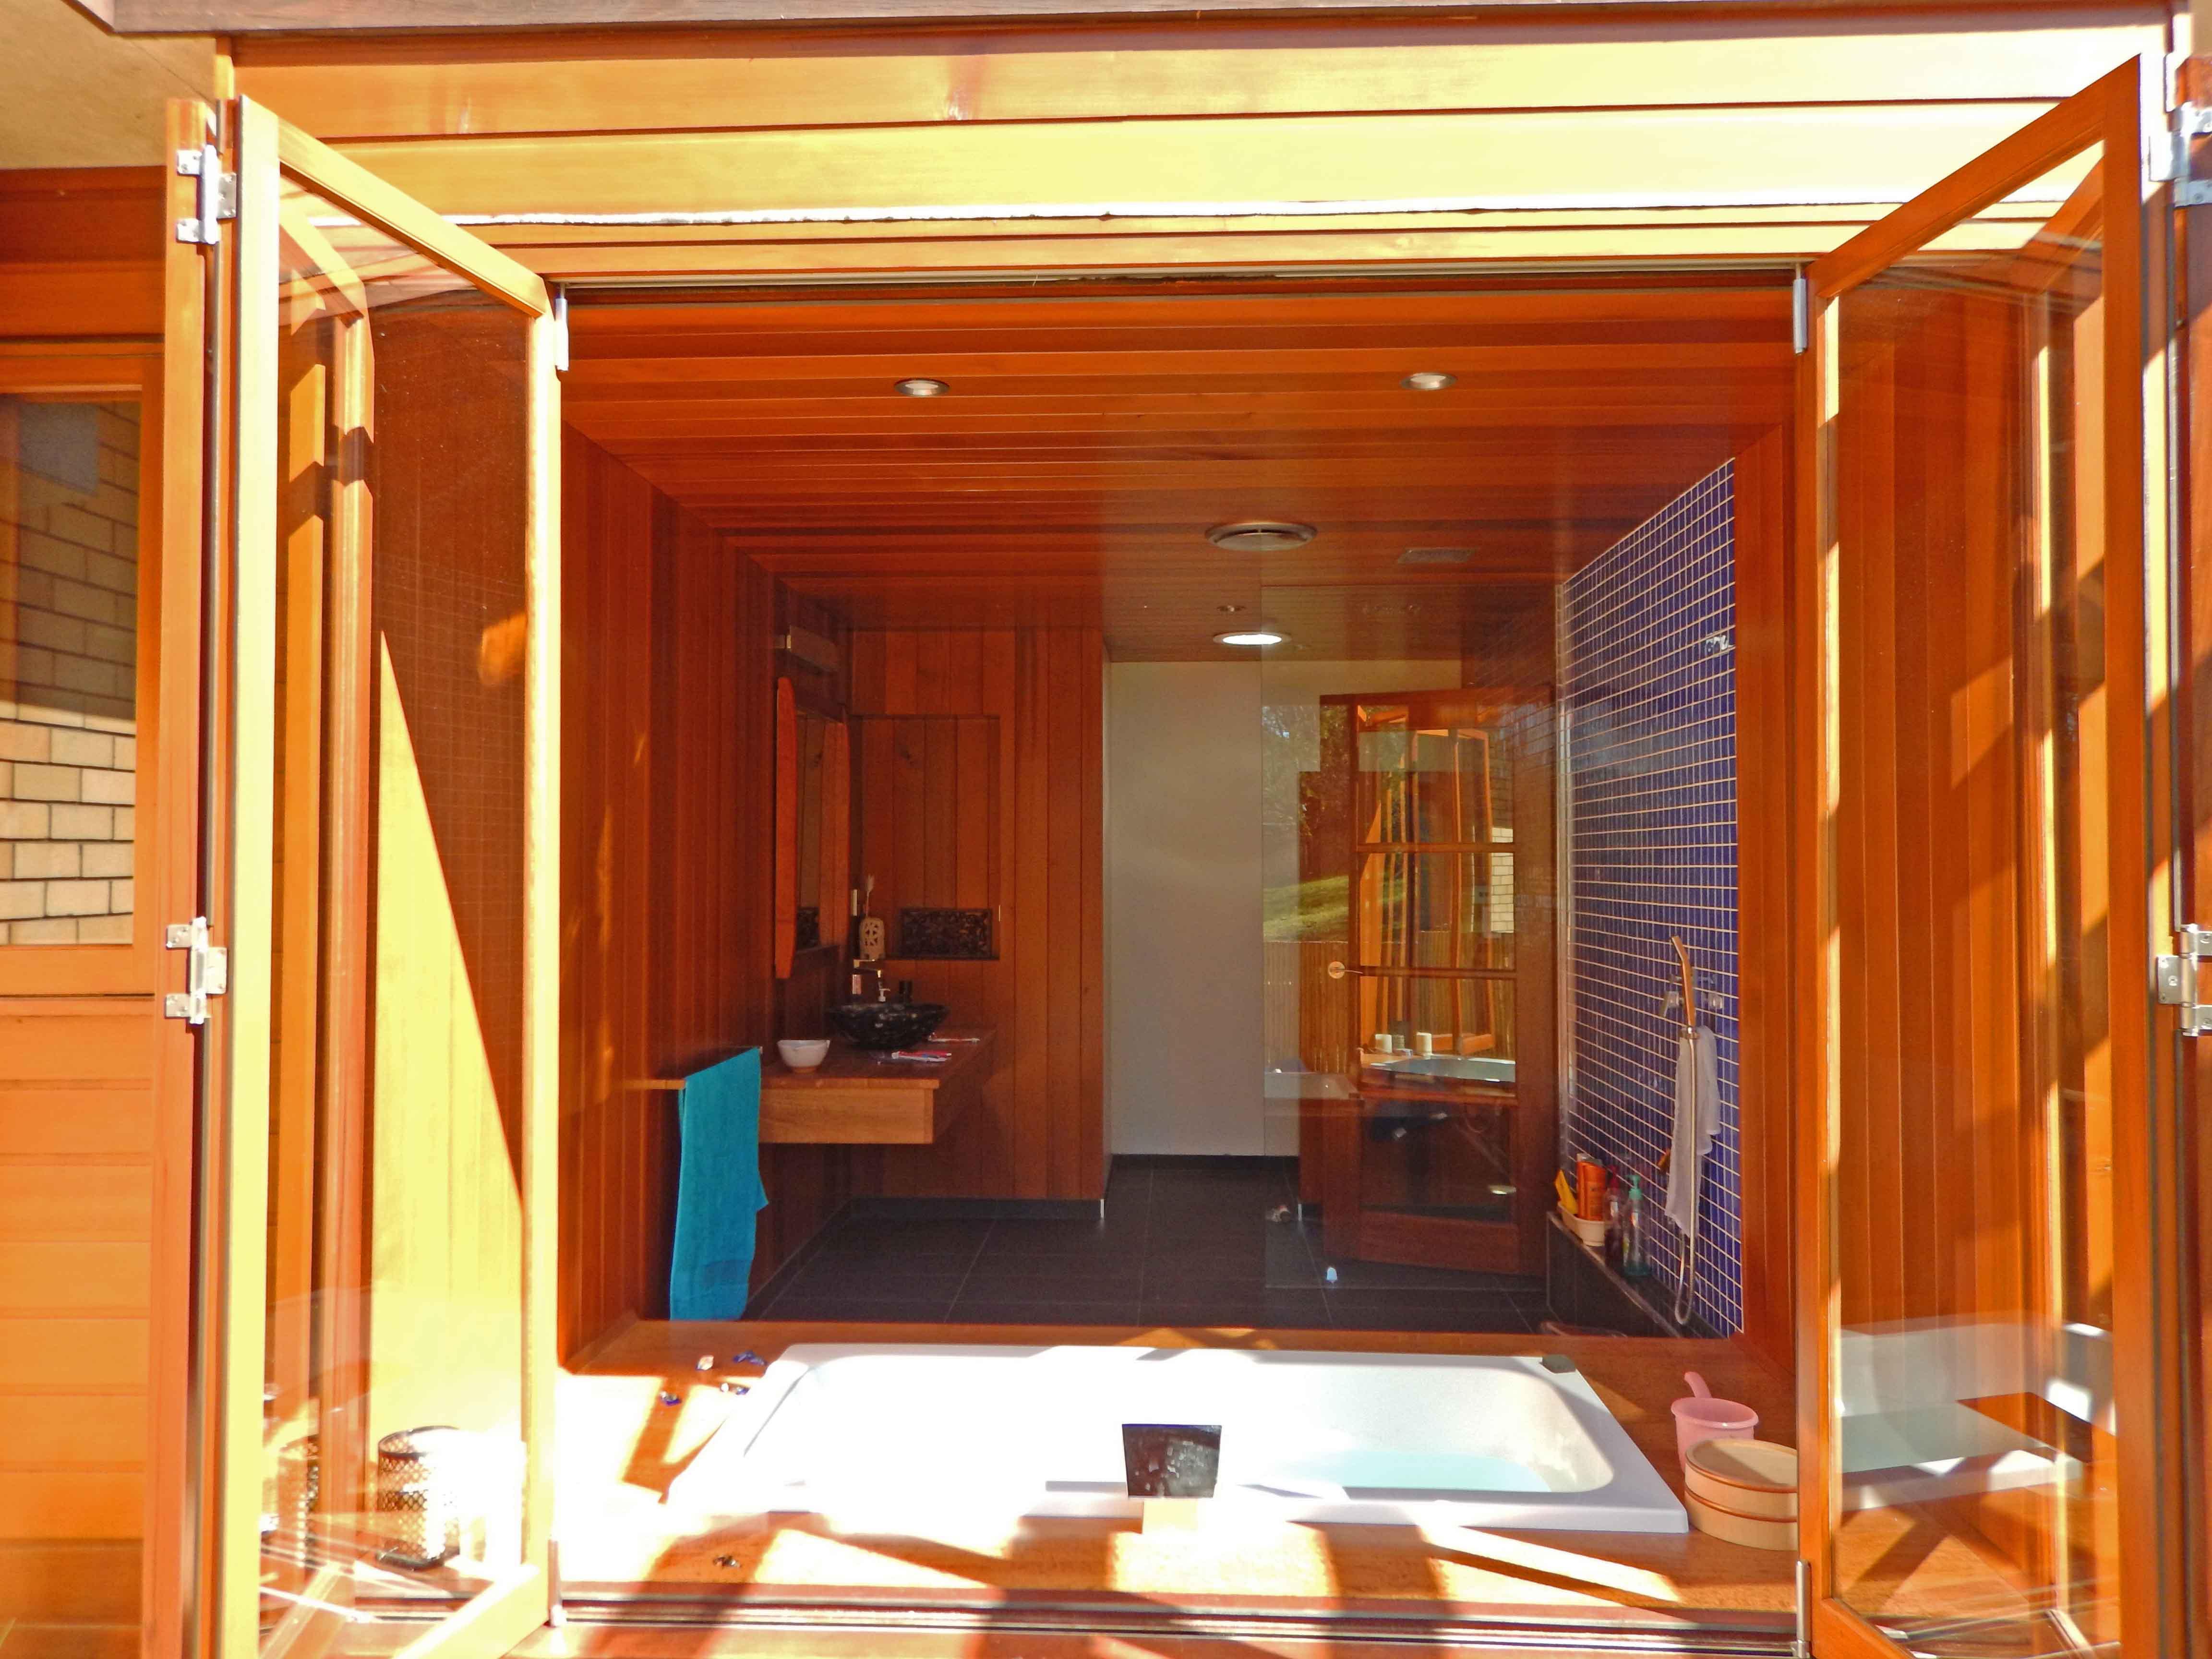 moore-bath-window-exterior-shot